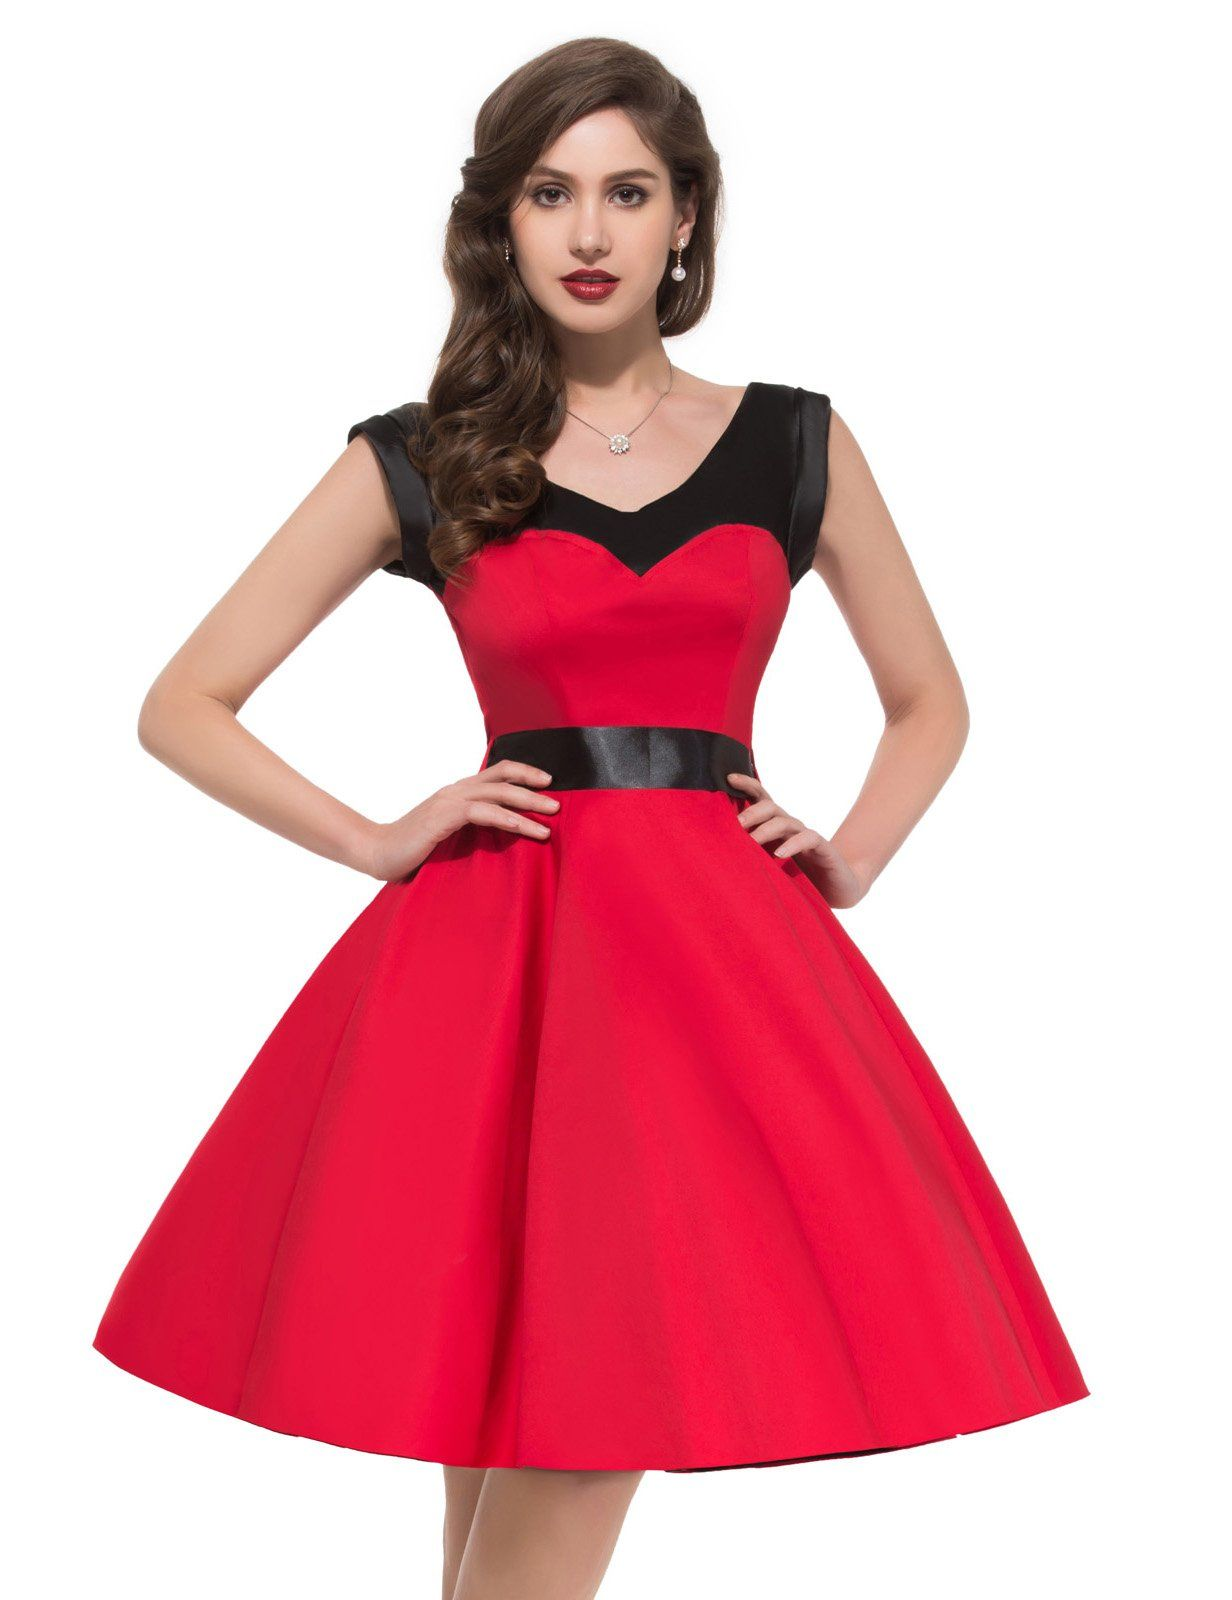 Robot Check Vintage Red Dress Red Dresses Classy Retro Vintage Dresses [ 1600 x 1232 Pixel ]